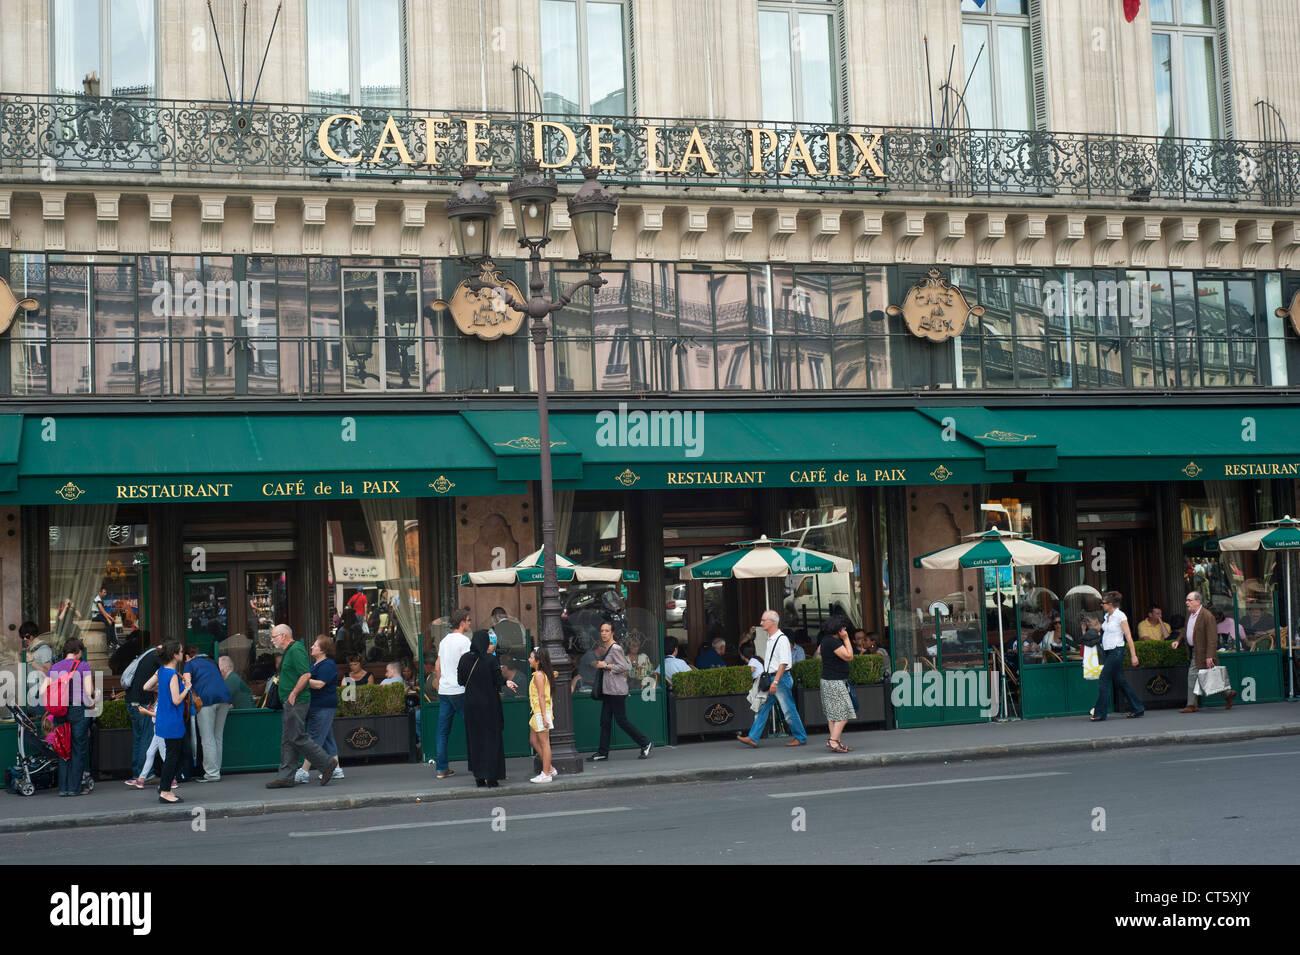 Cafe La Opera